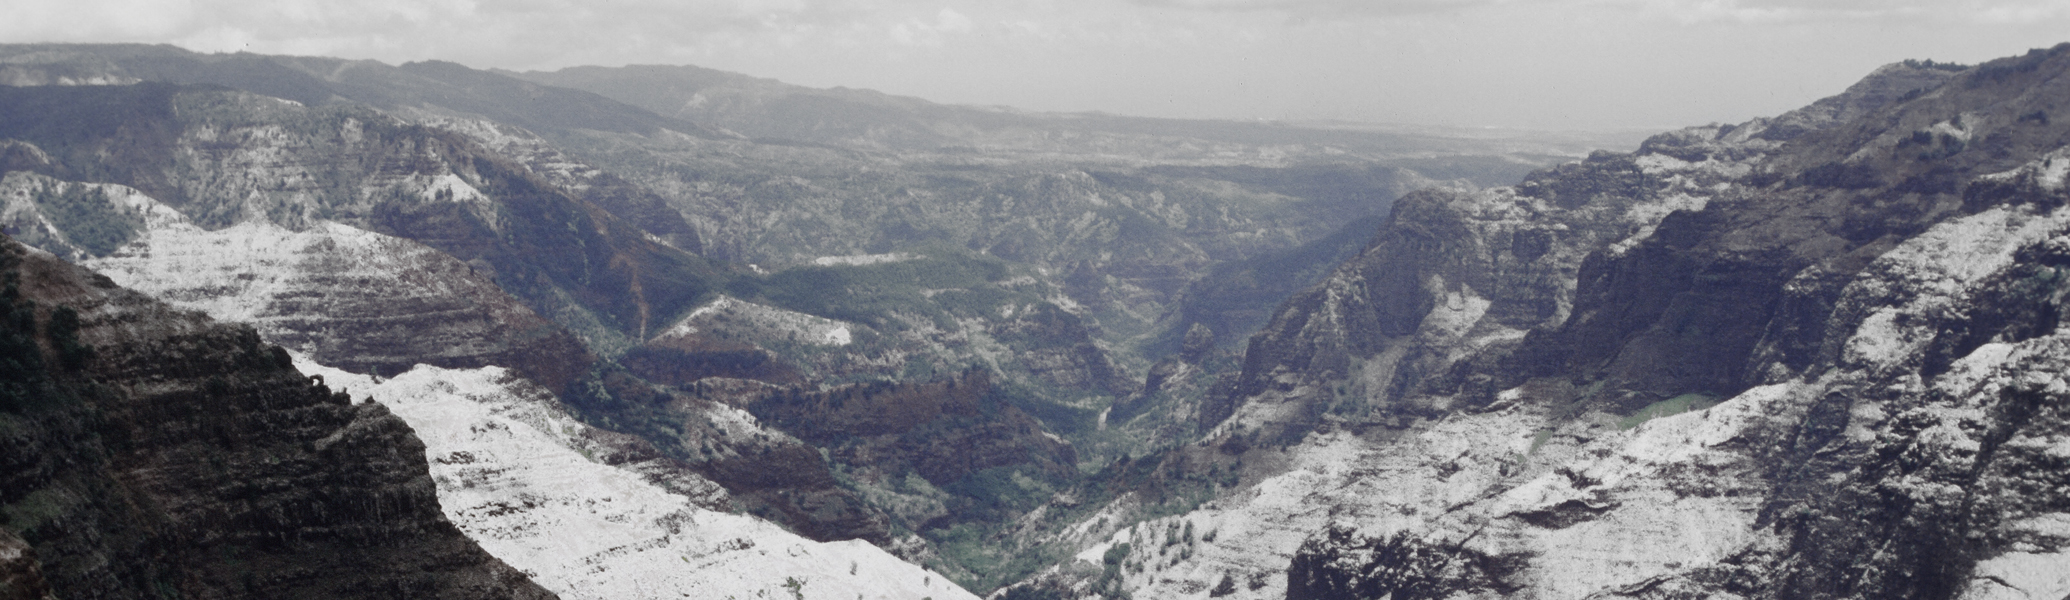 Mountain Landscape, 2018